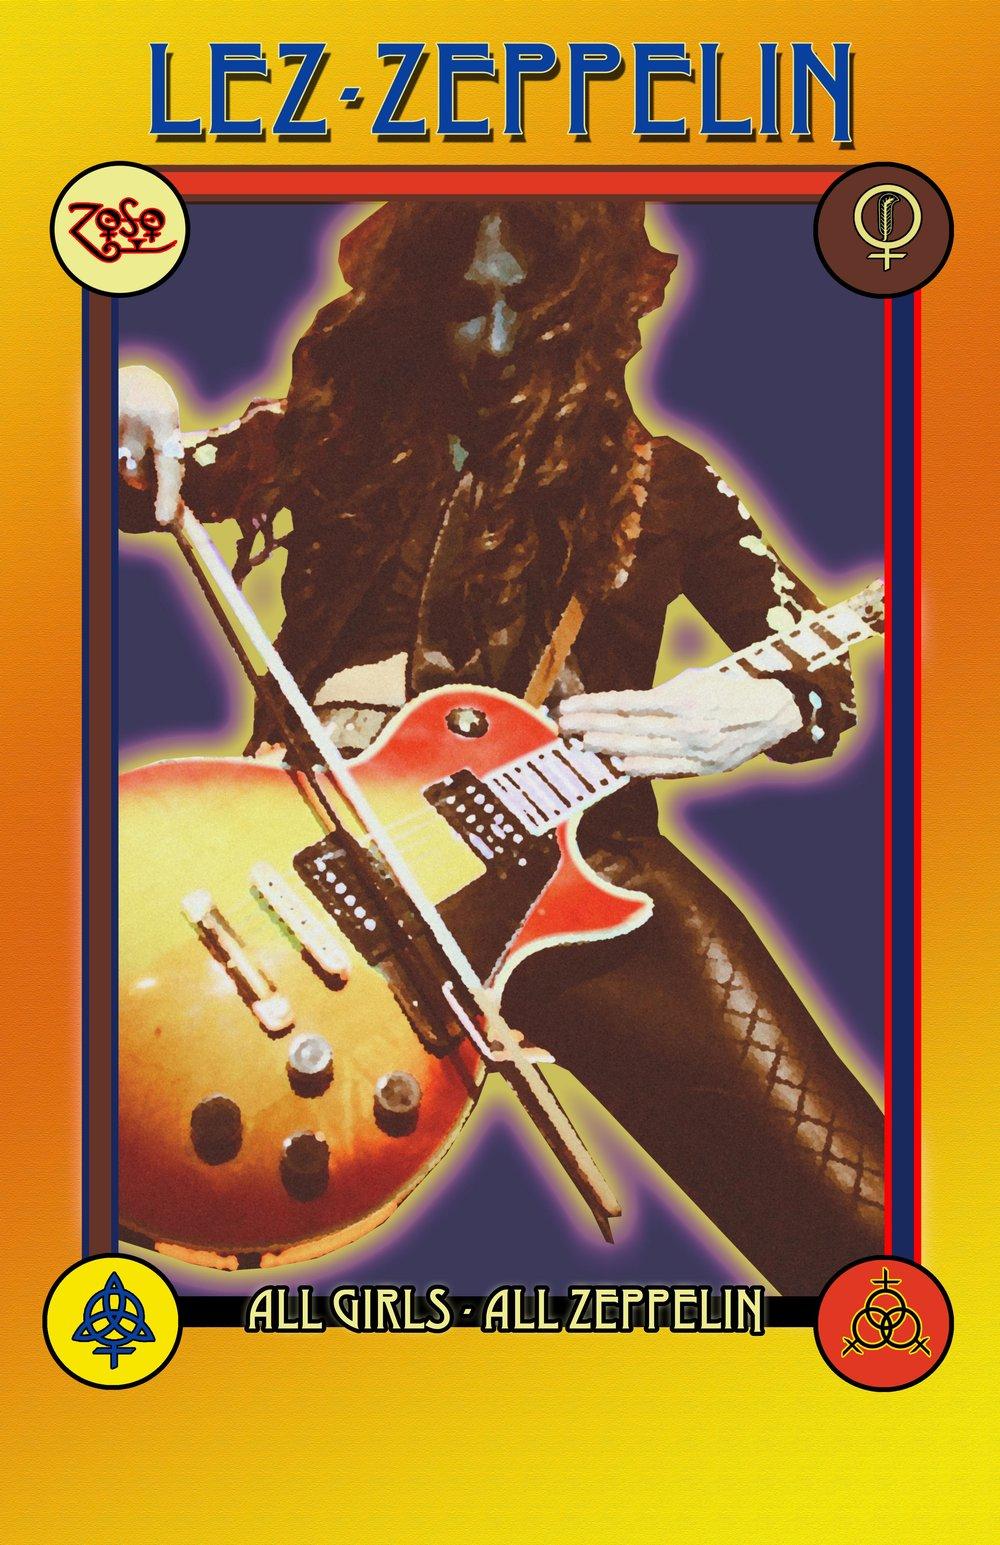 Lez Zeppelin Poster.jpg